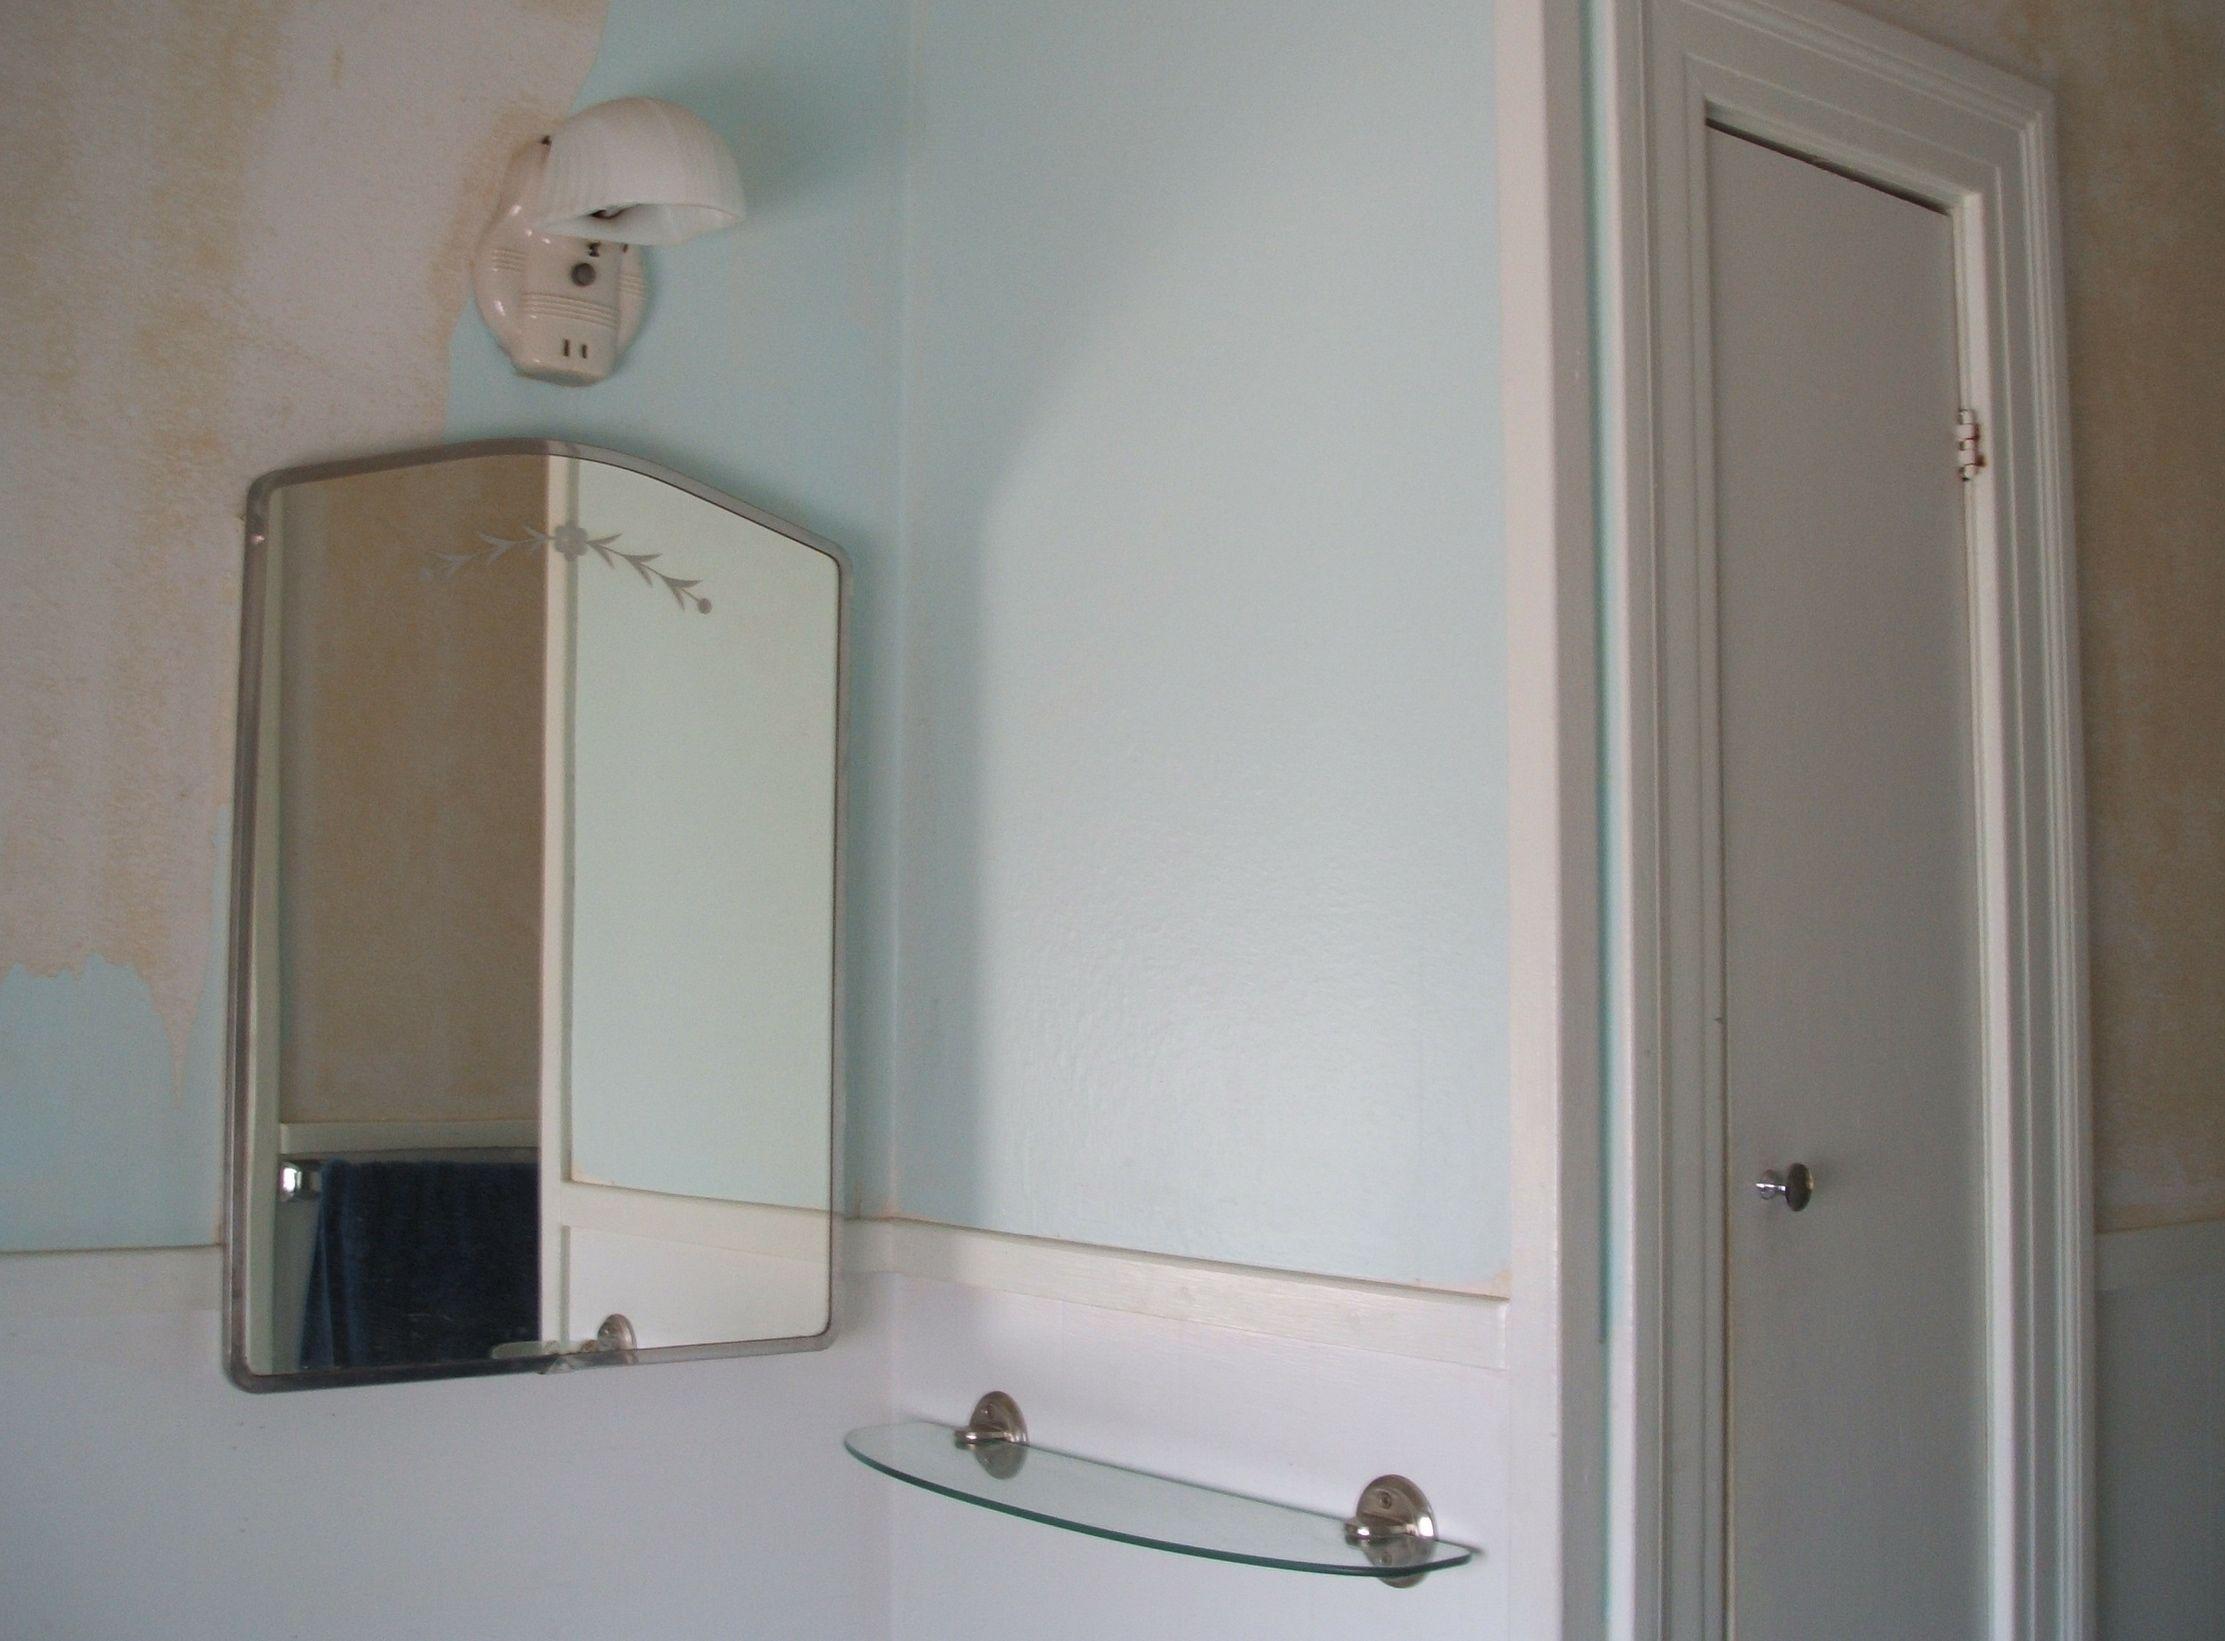 Bathroom Cabinet Mirror Replacement Pinterdor Pinterest Rh Com